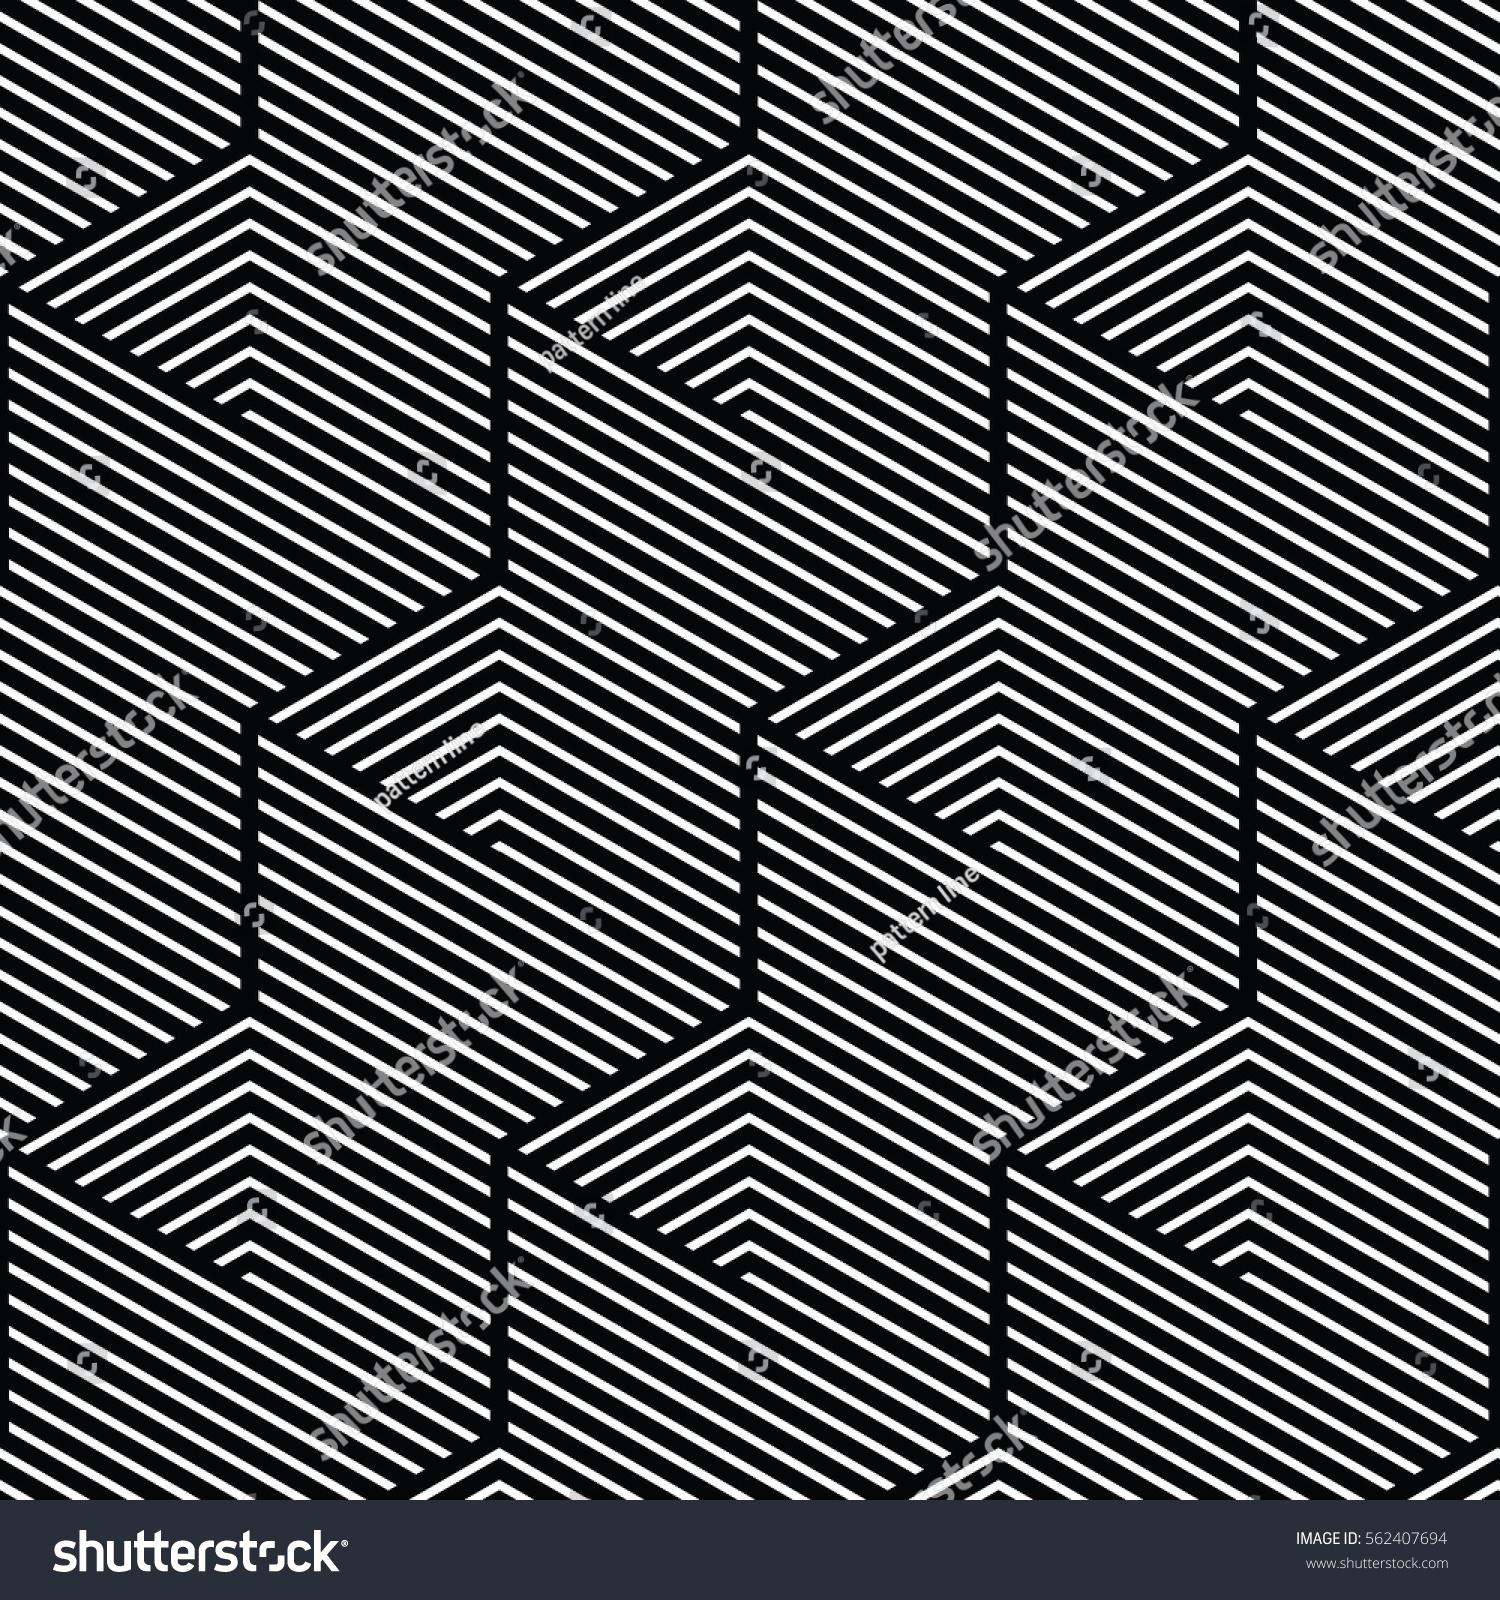 Line Texture Vector : White gray patternbackground line geometricmodern stylish